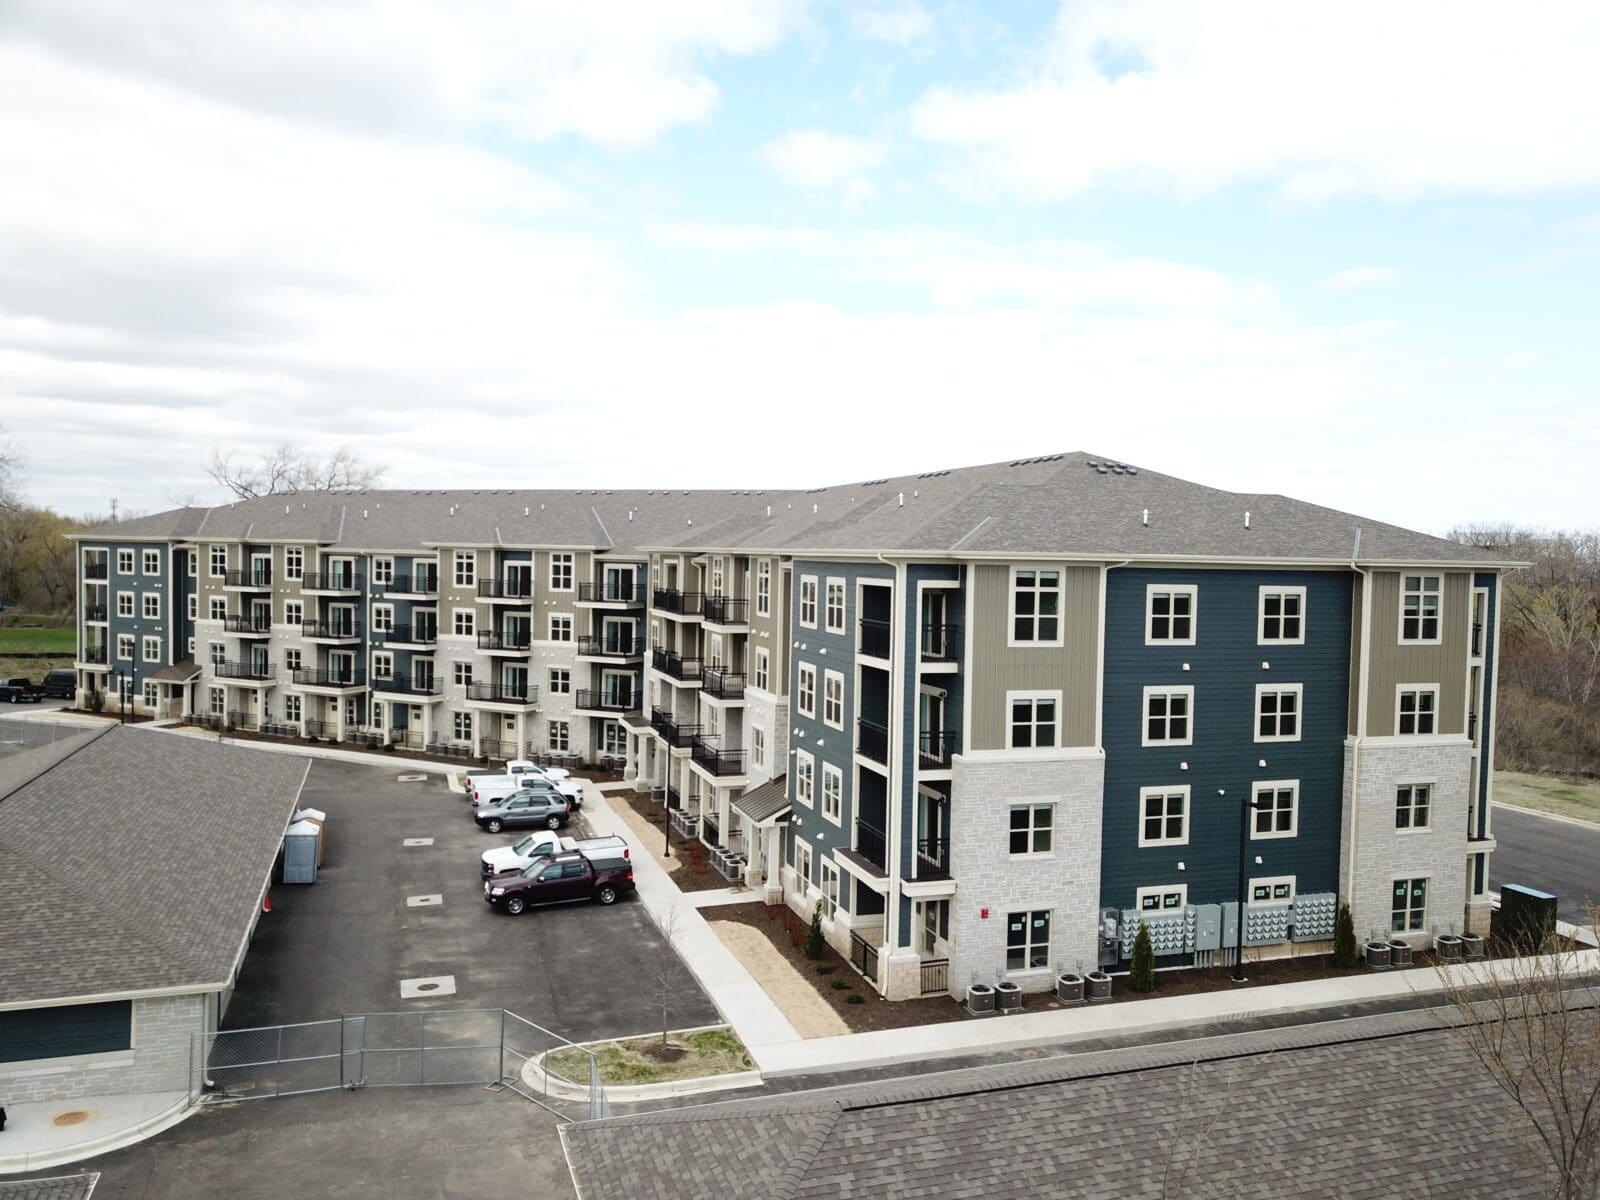 construction management associates, general contractors, Pike Ridge Apartments & Townhomes